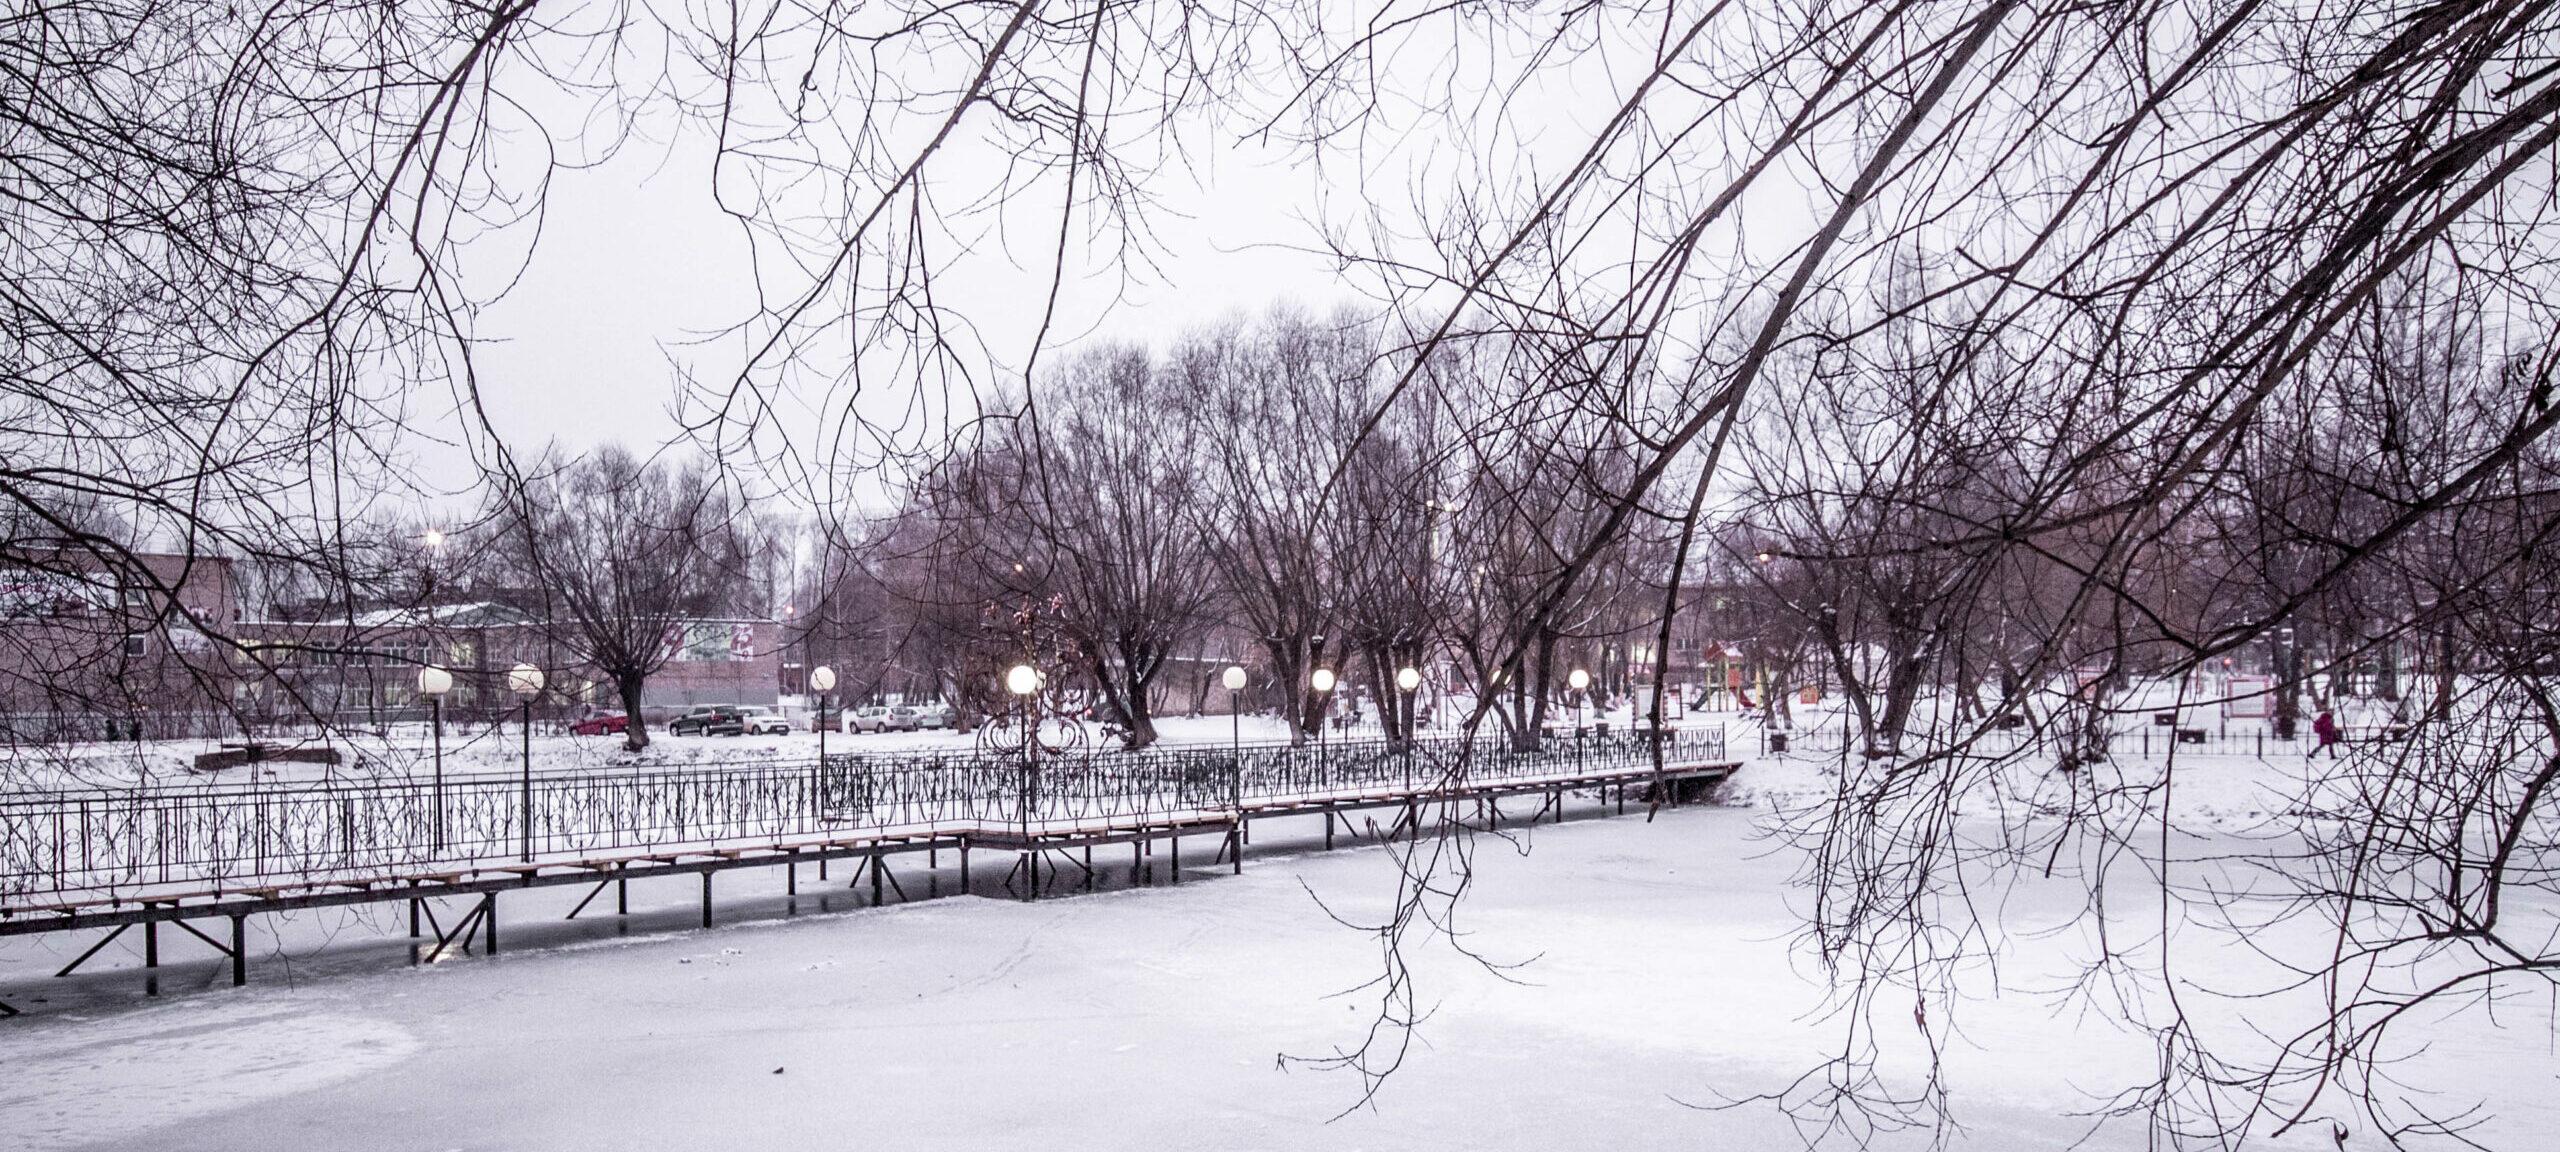 Арт-объект «Дерево жизни» в Чернушке